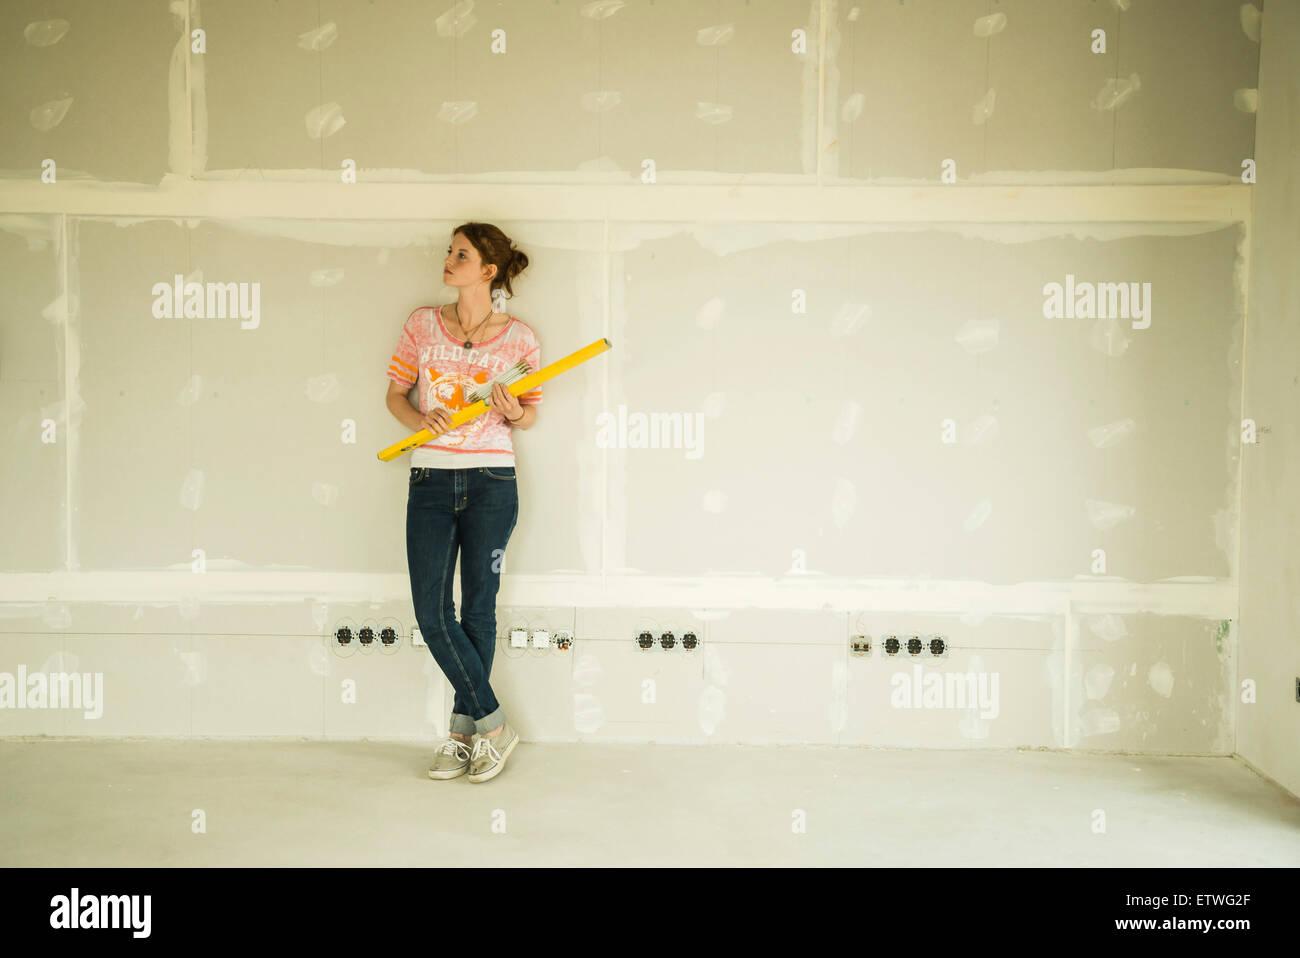 Young woman renovating standing at blank wall - Stock Image